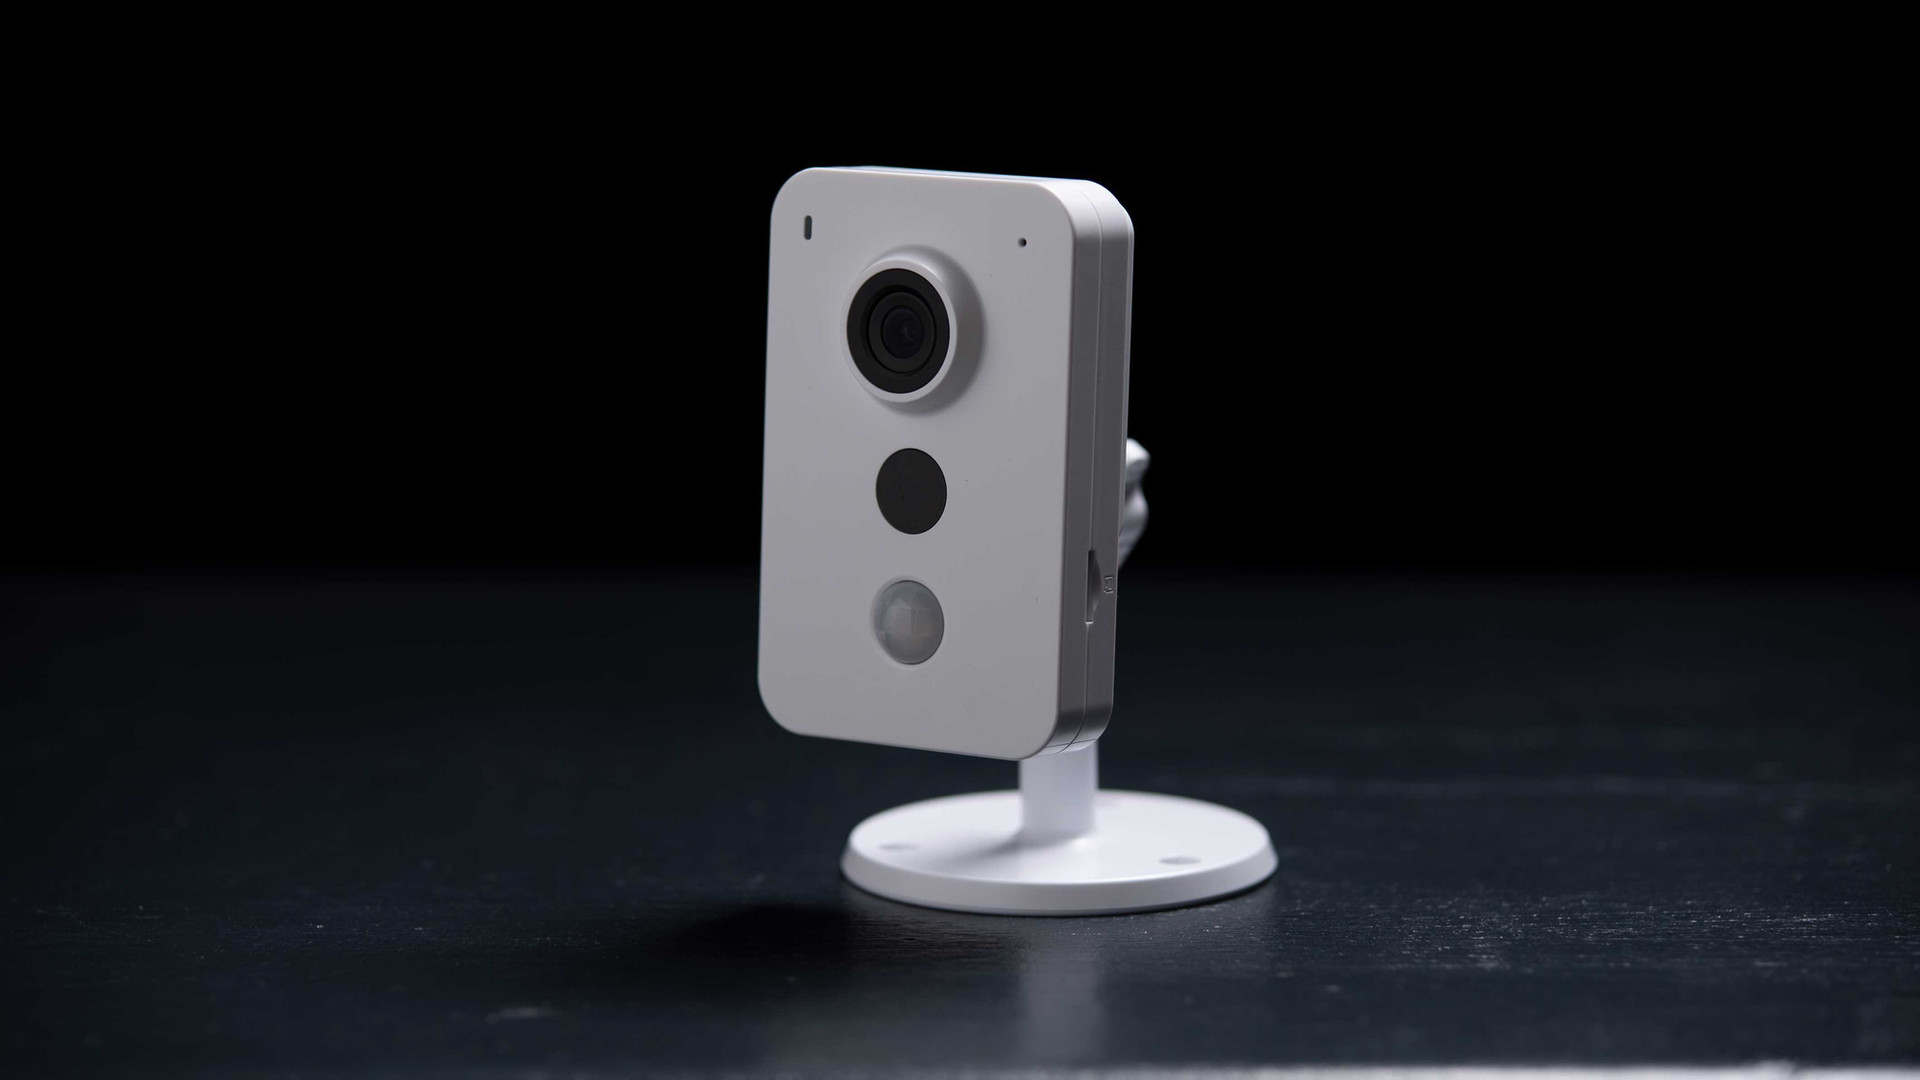 LiveViz Monitored Security Camera From AMCO